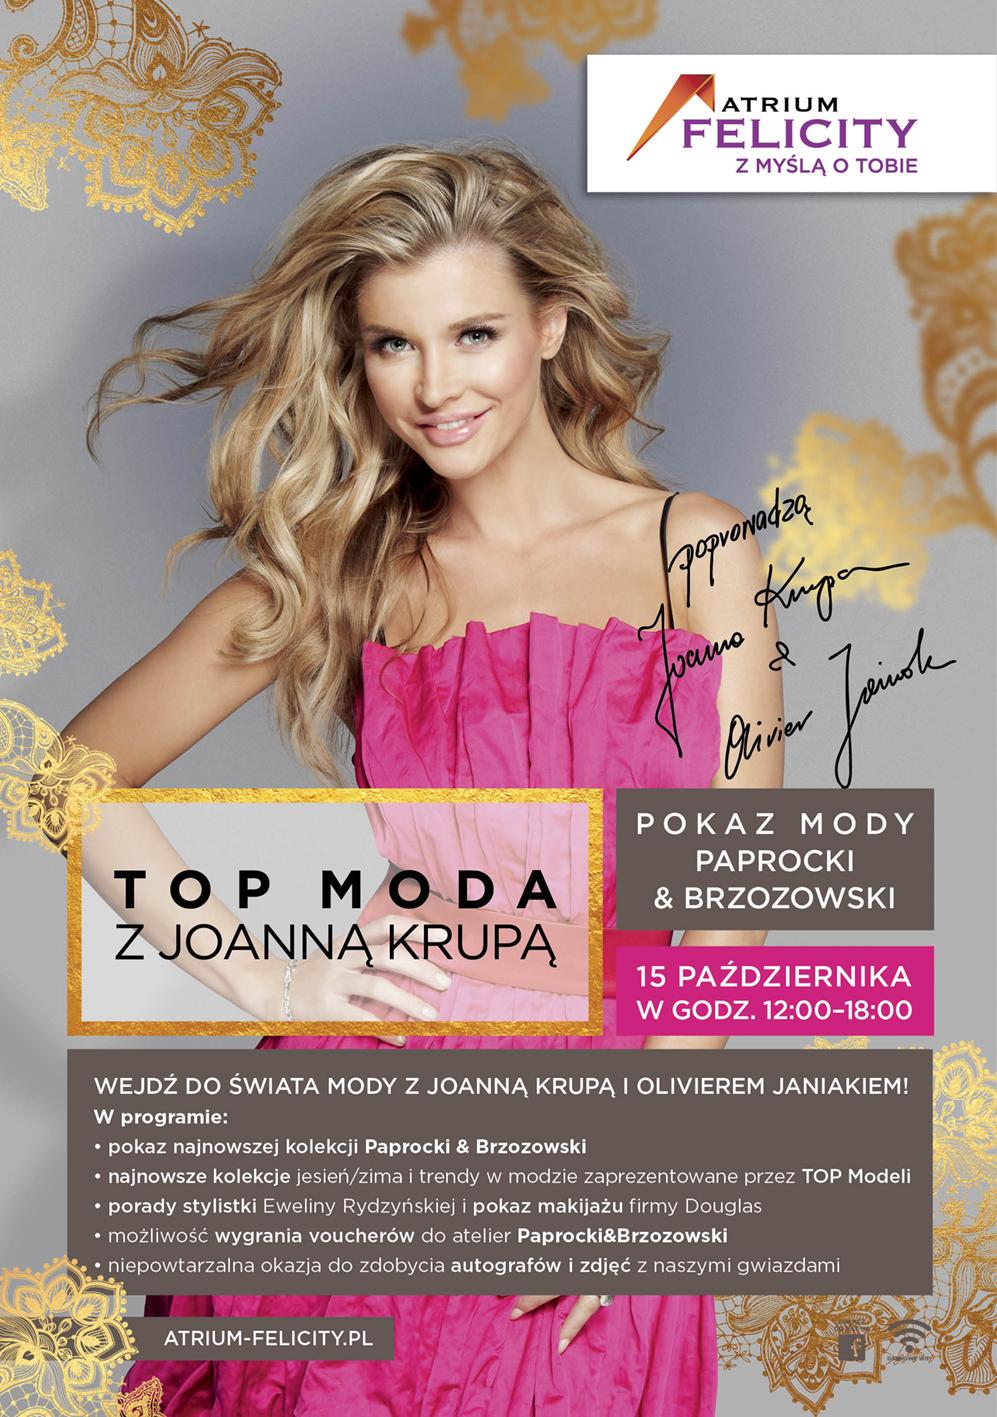 Felicity_TopModa_JKrupa_plakat-B1